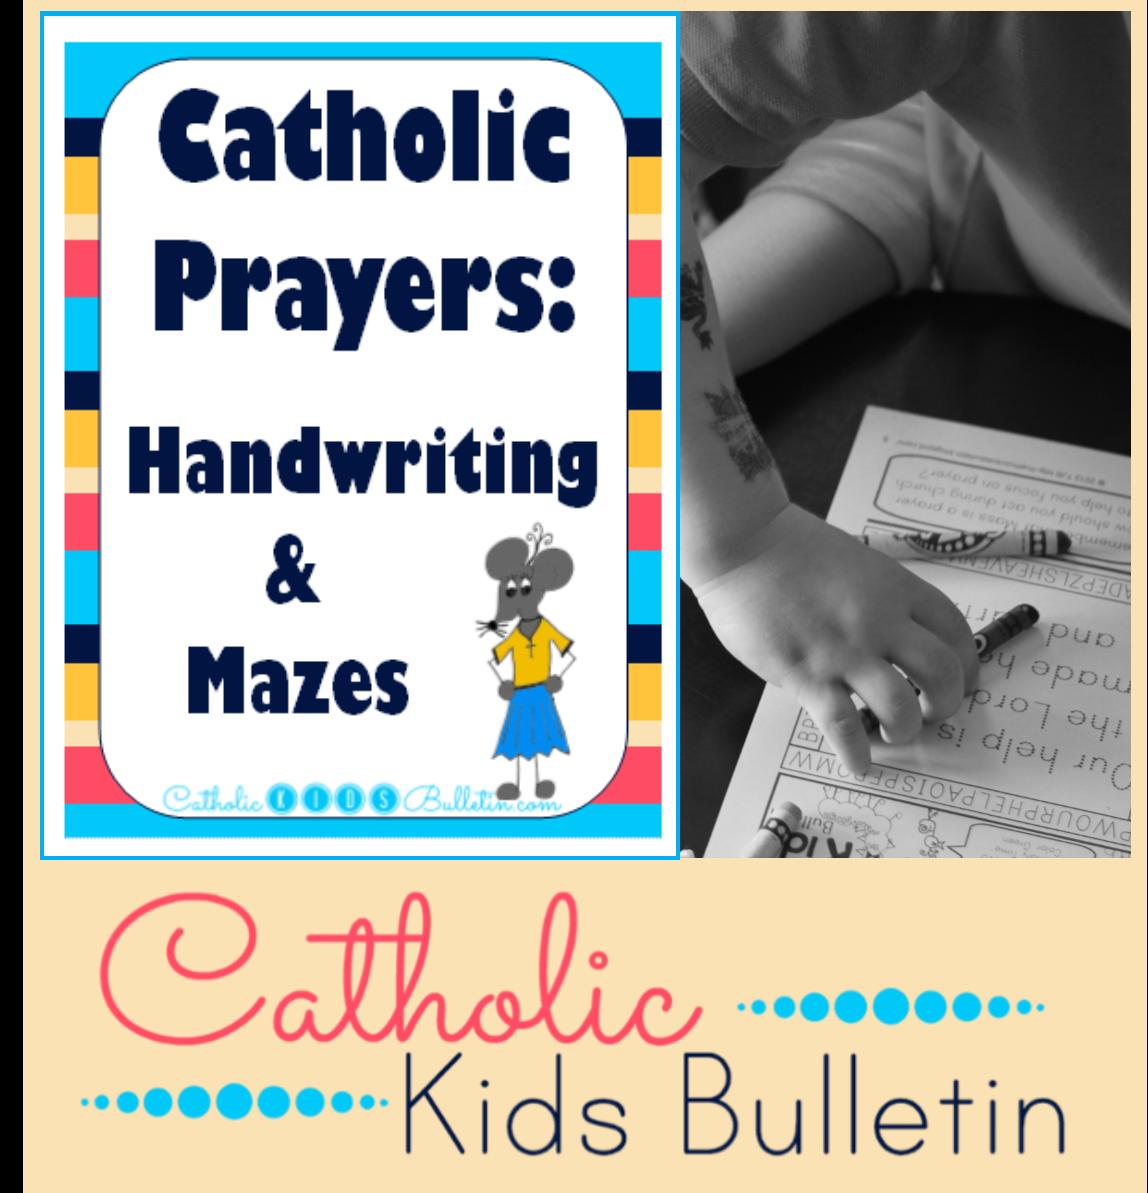 Catholic Prayers Handwriting and Mazes Printable Worksheets 2 at